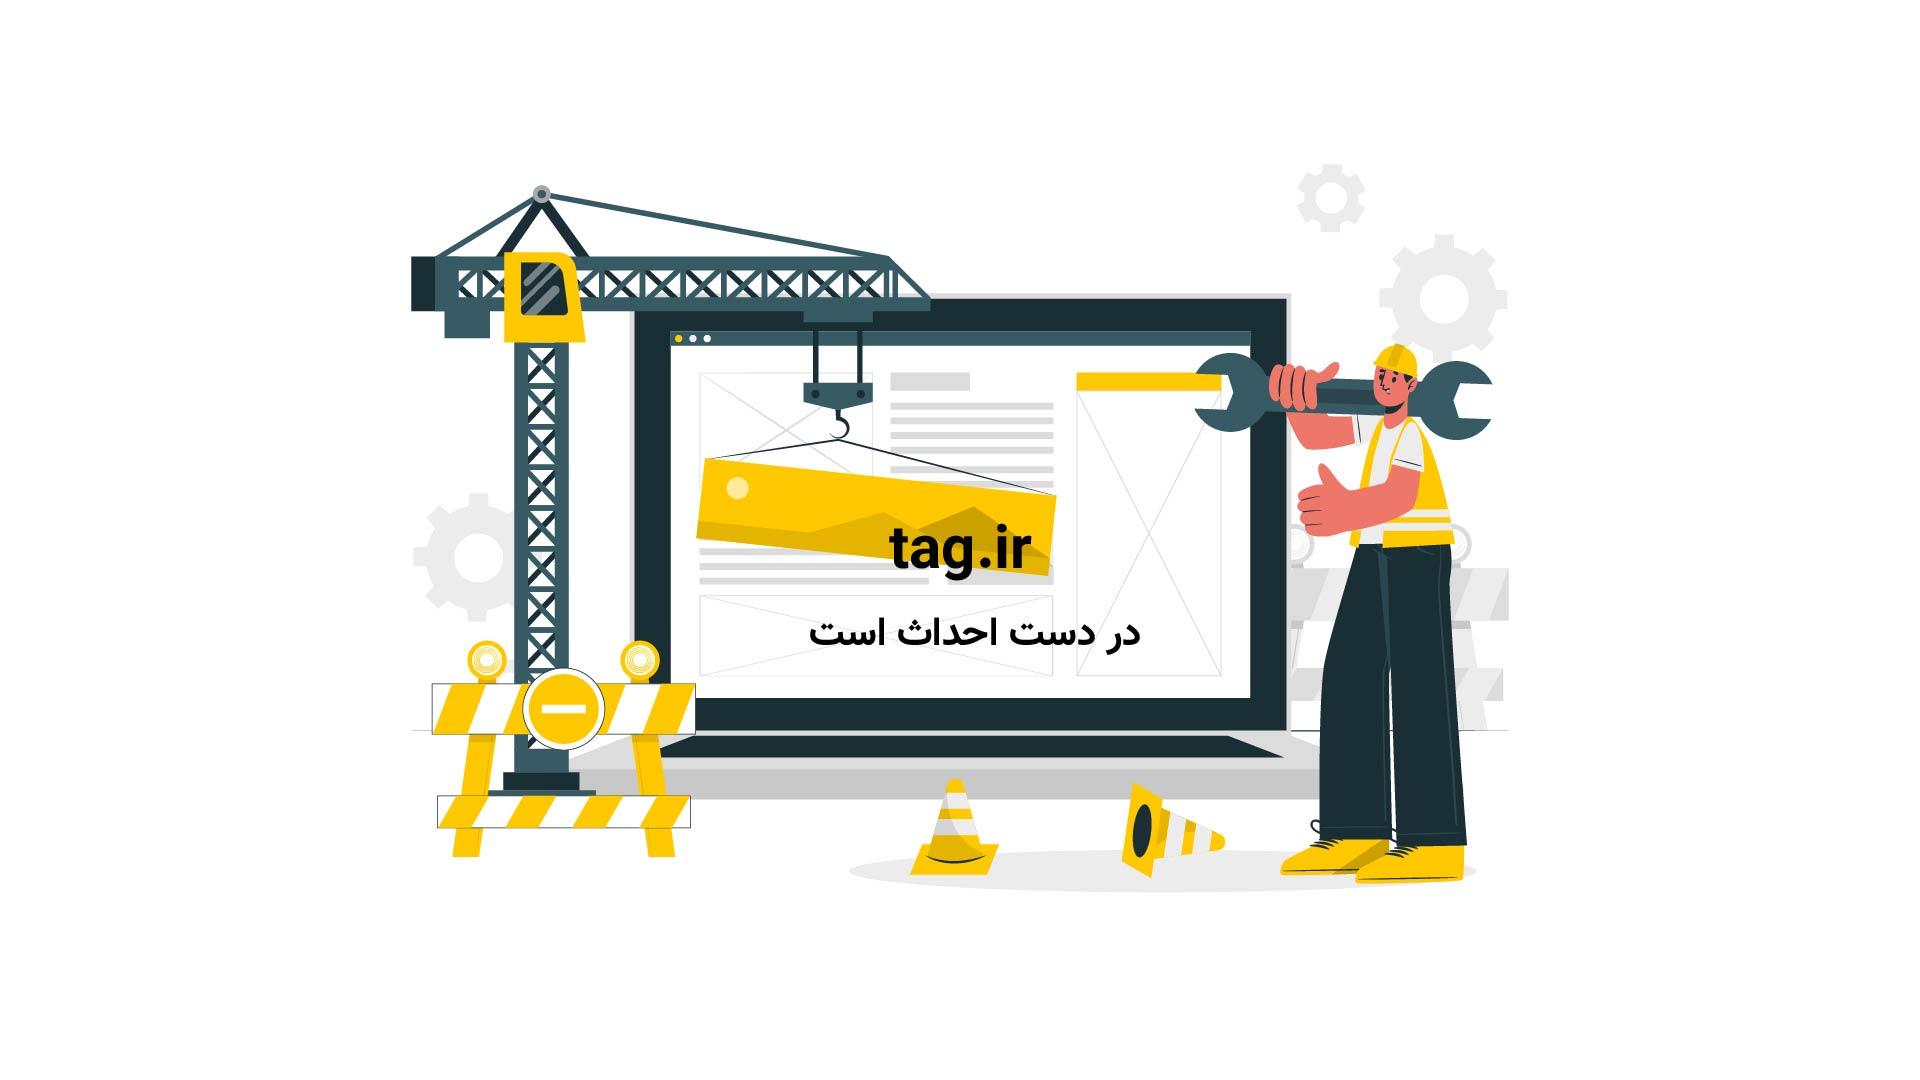 لحظۀ حملۀ اسرائیل به غزه